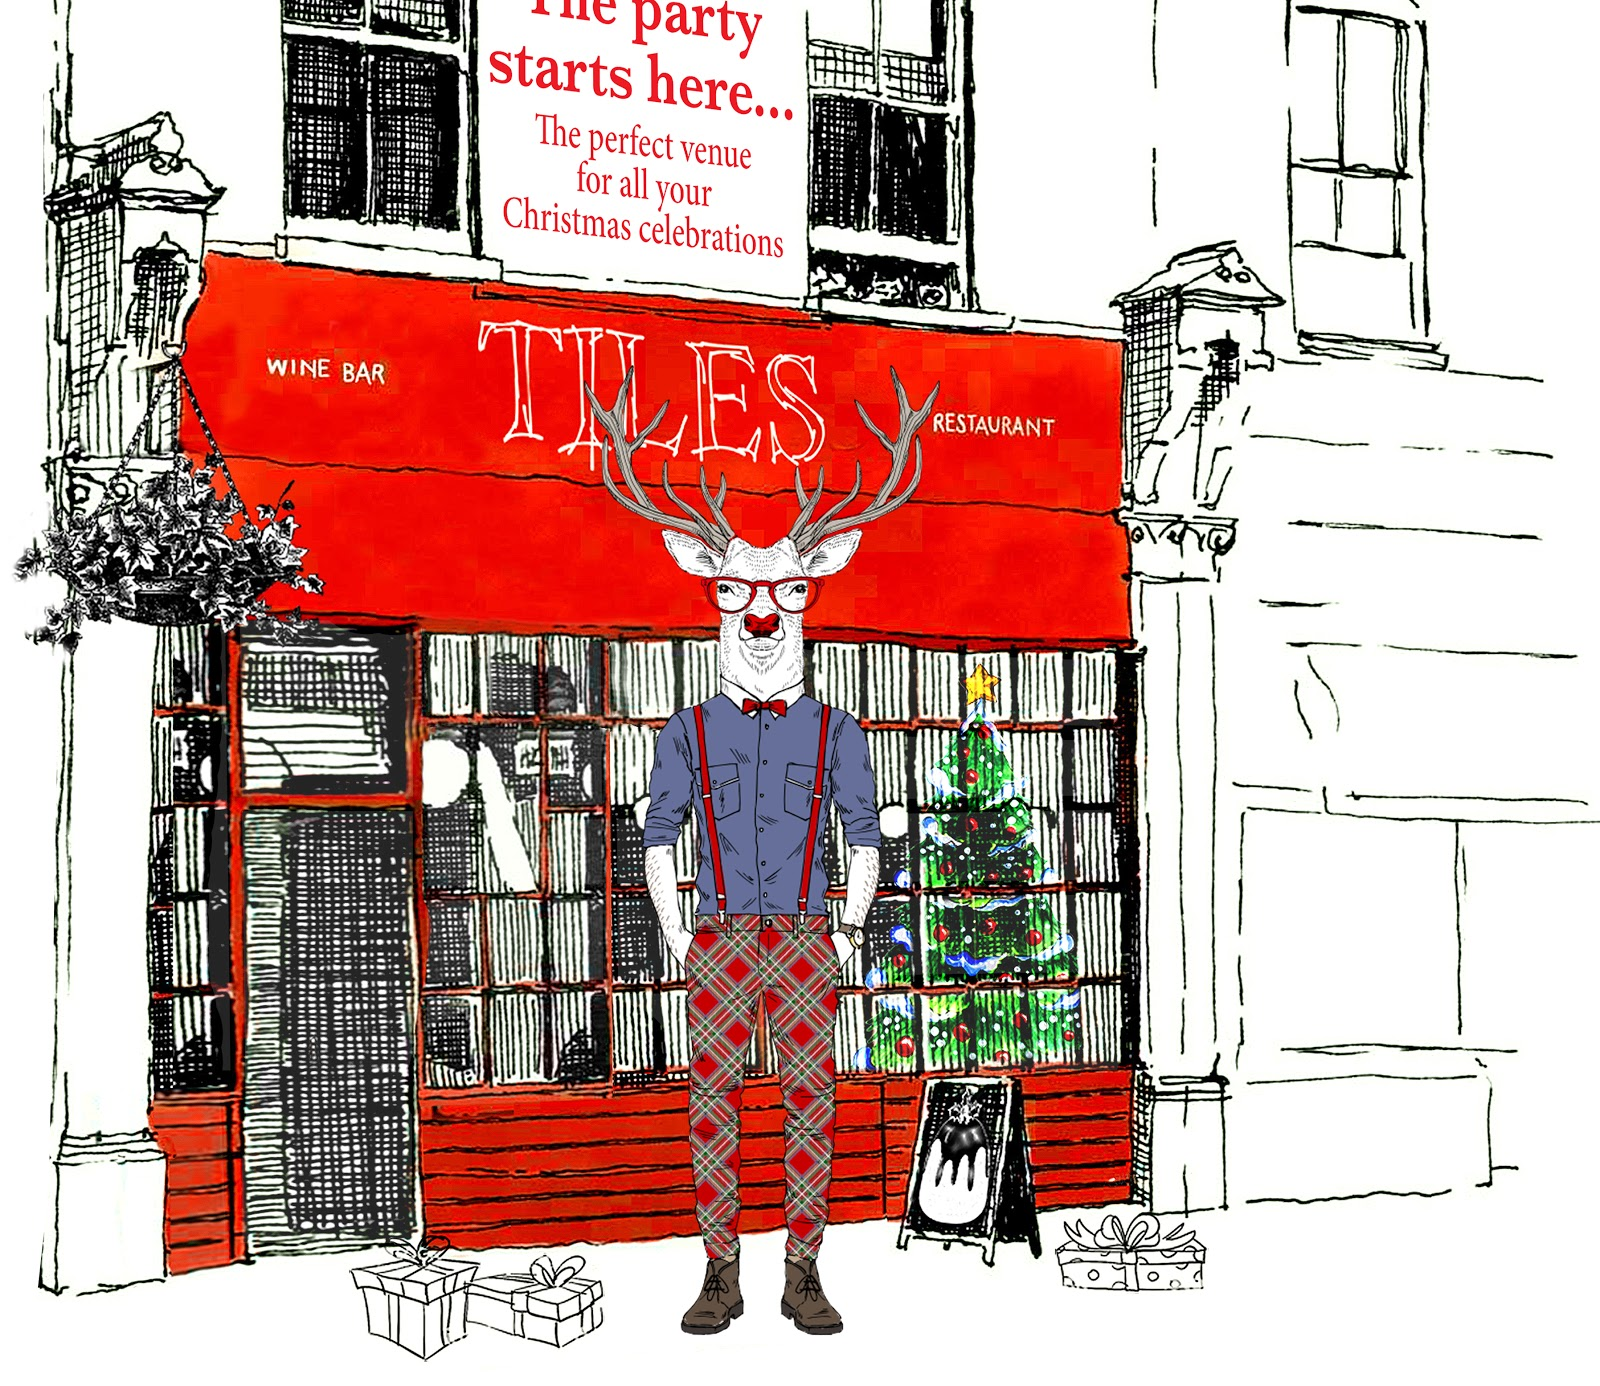 Tiles Restaurant & Bar